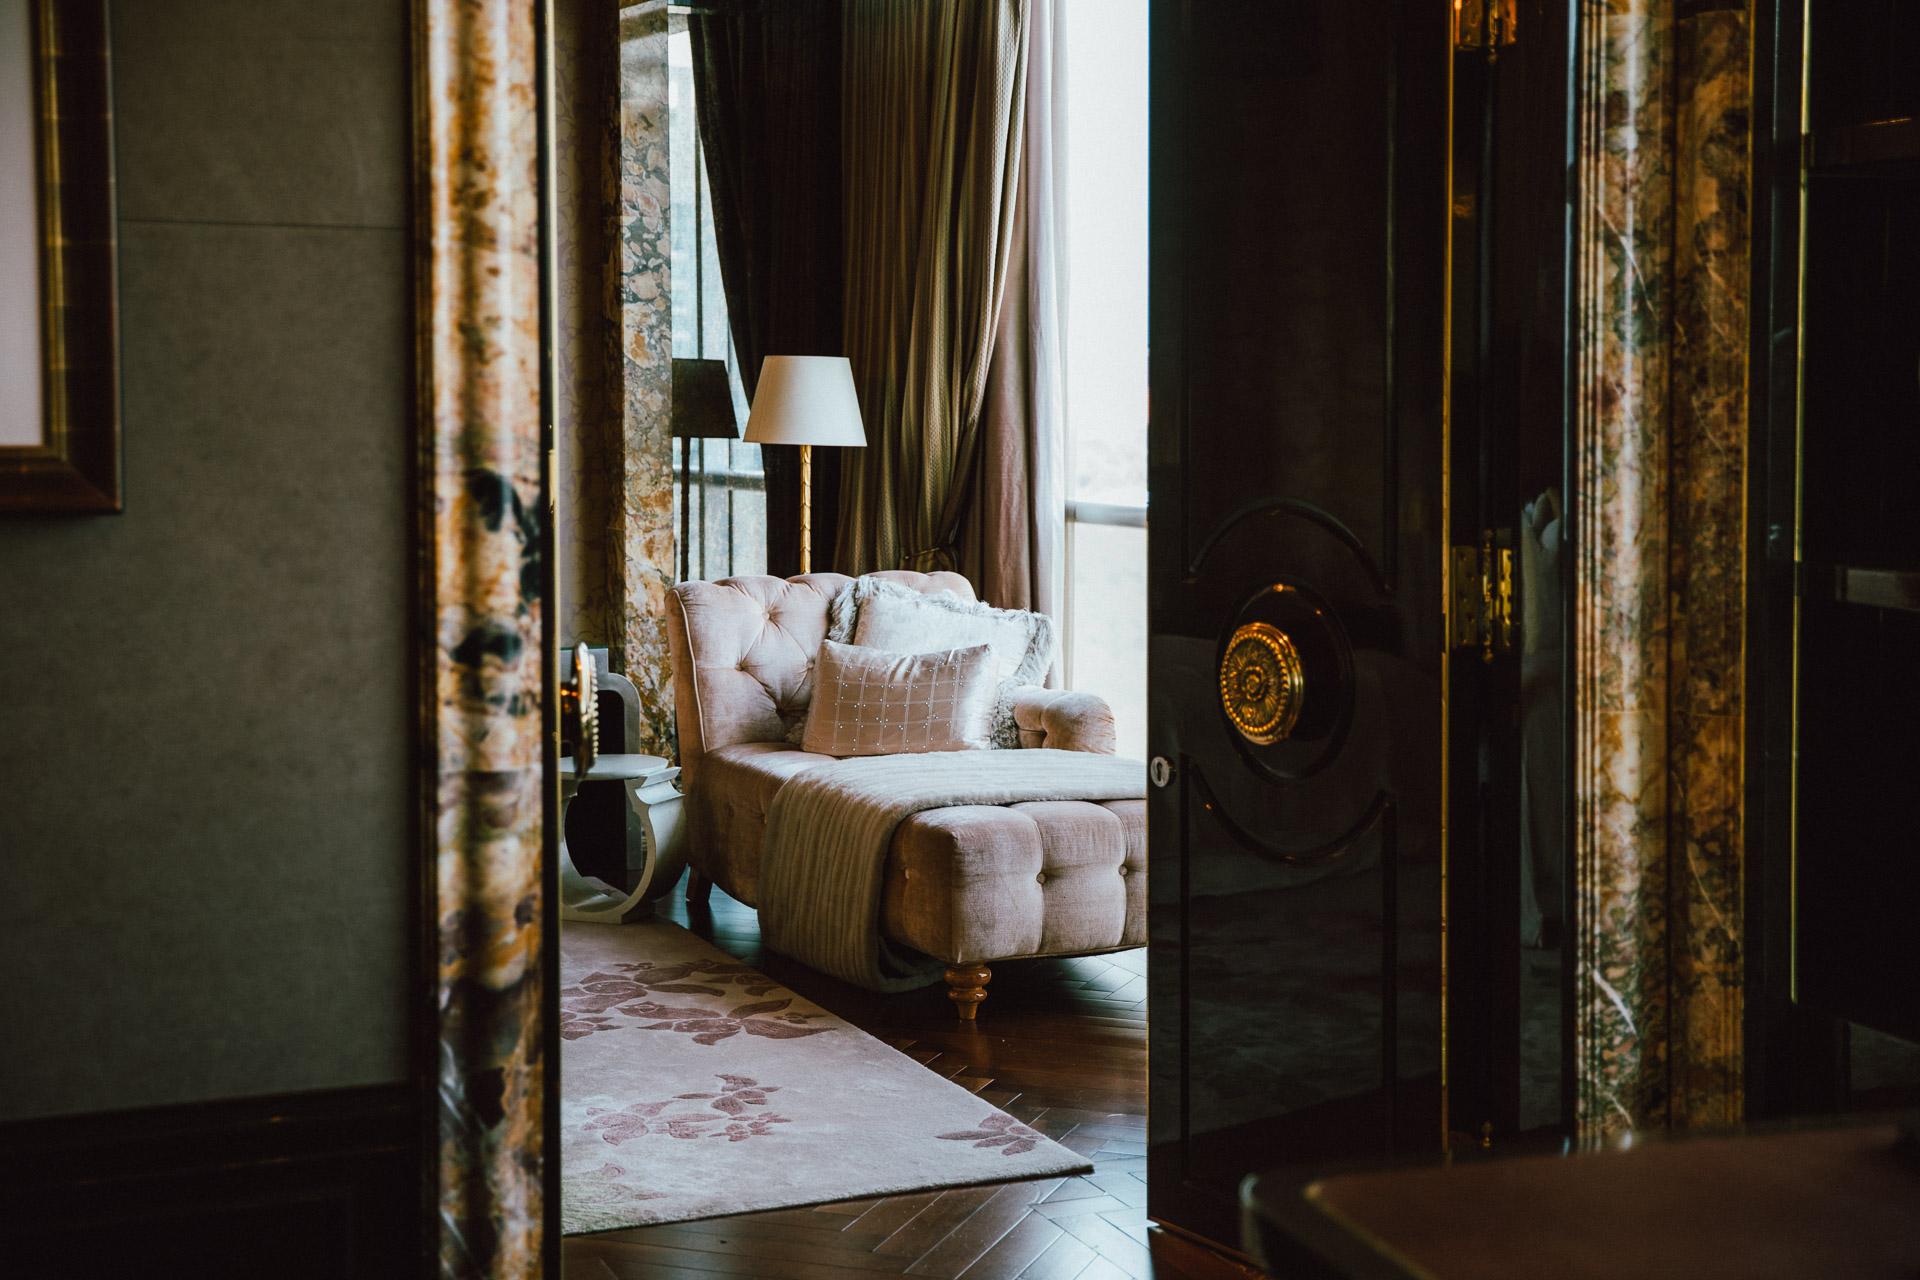 st-regis-singapore-marriott-luxury-hotel-photographer-18.jpg